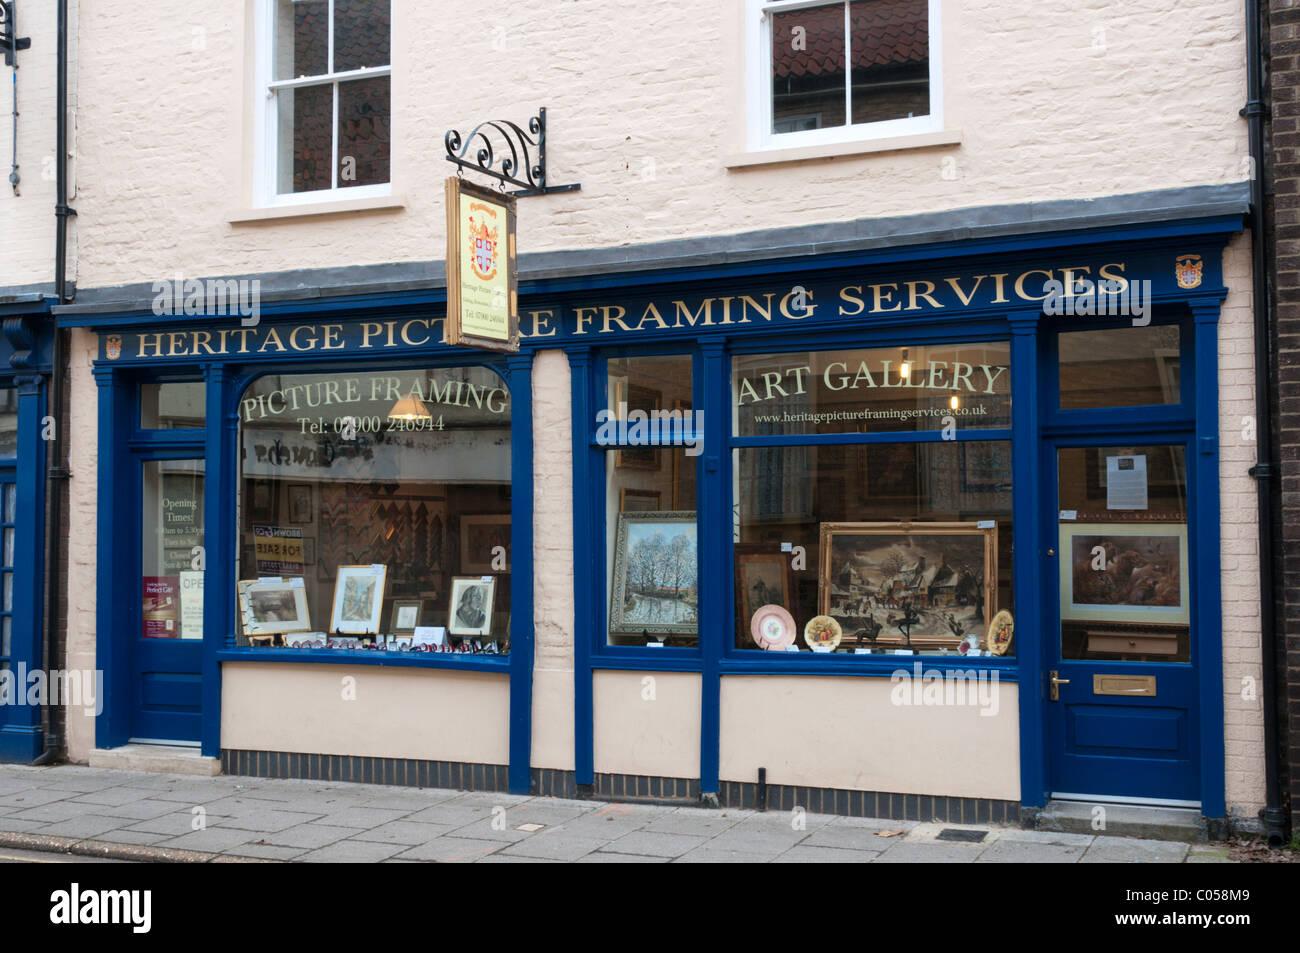 Picture Framing Shop Imágenes De Stock & Picture Framing Shop Fotos ...